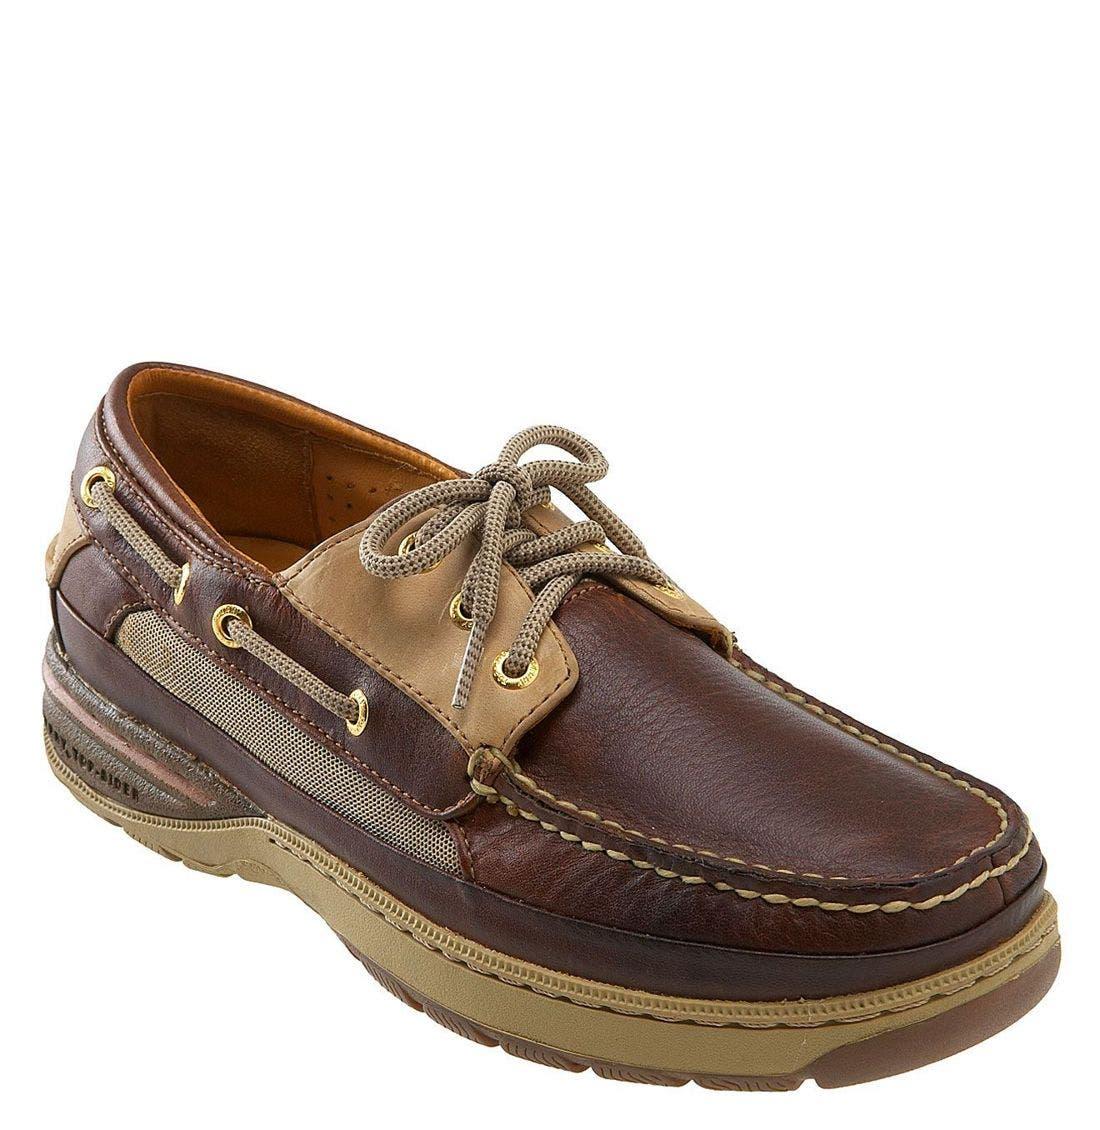 Main Image - Sperry 'Gold Billfish 3-Eye' Boat Shoe